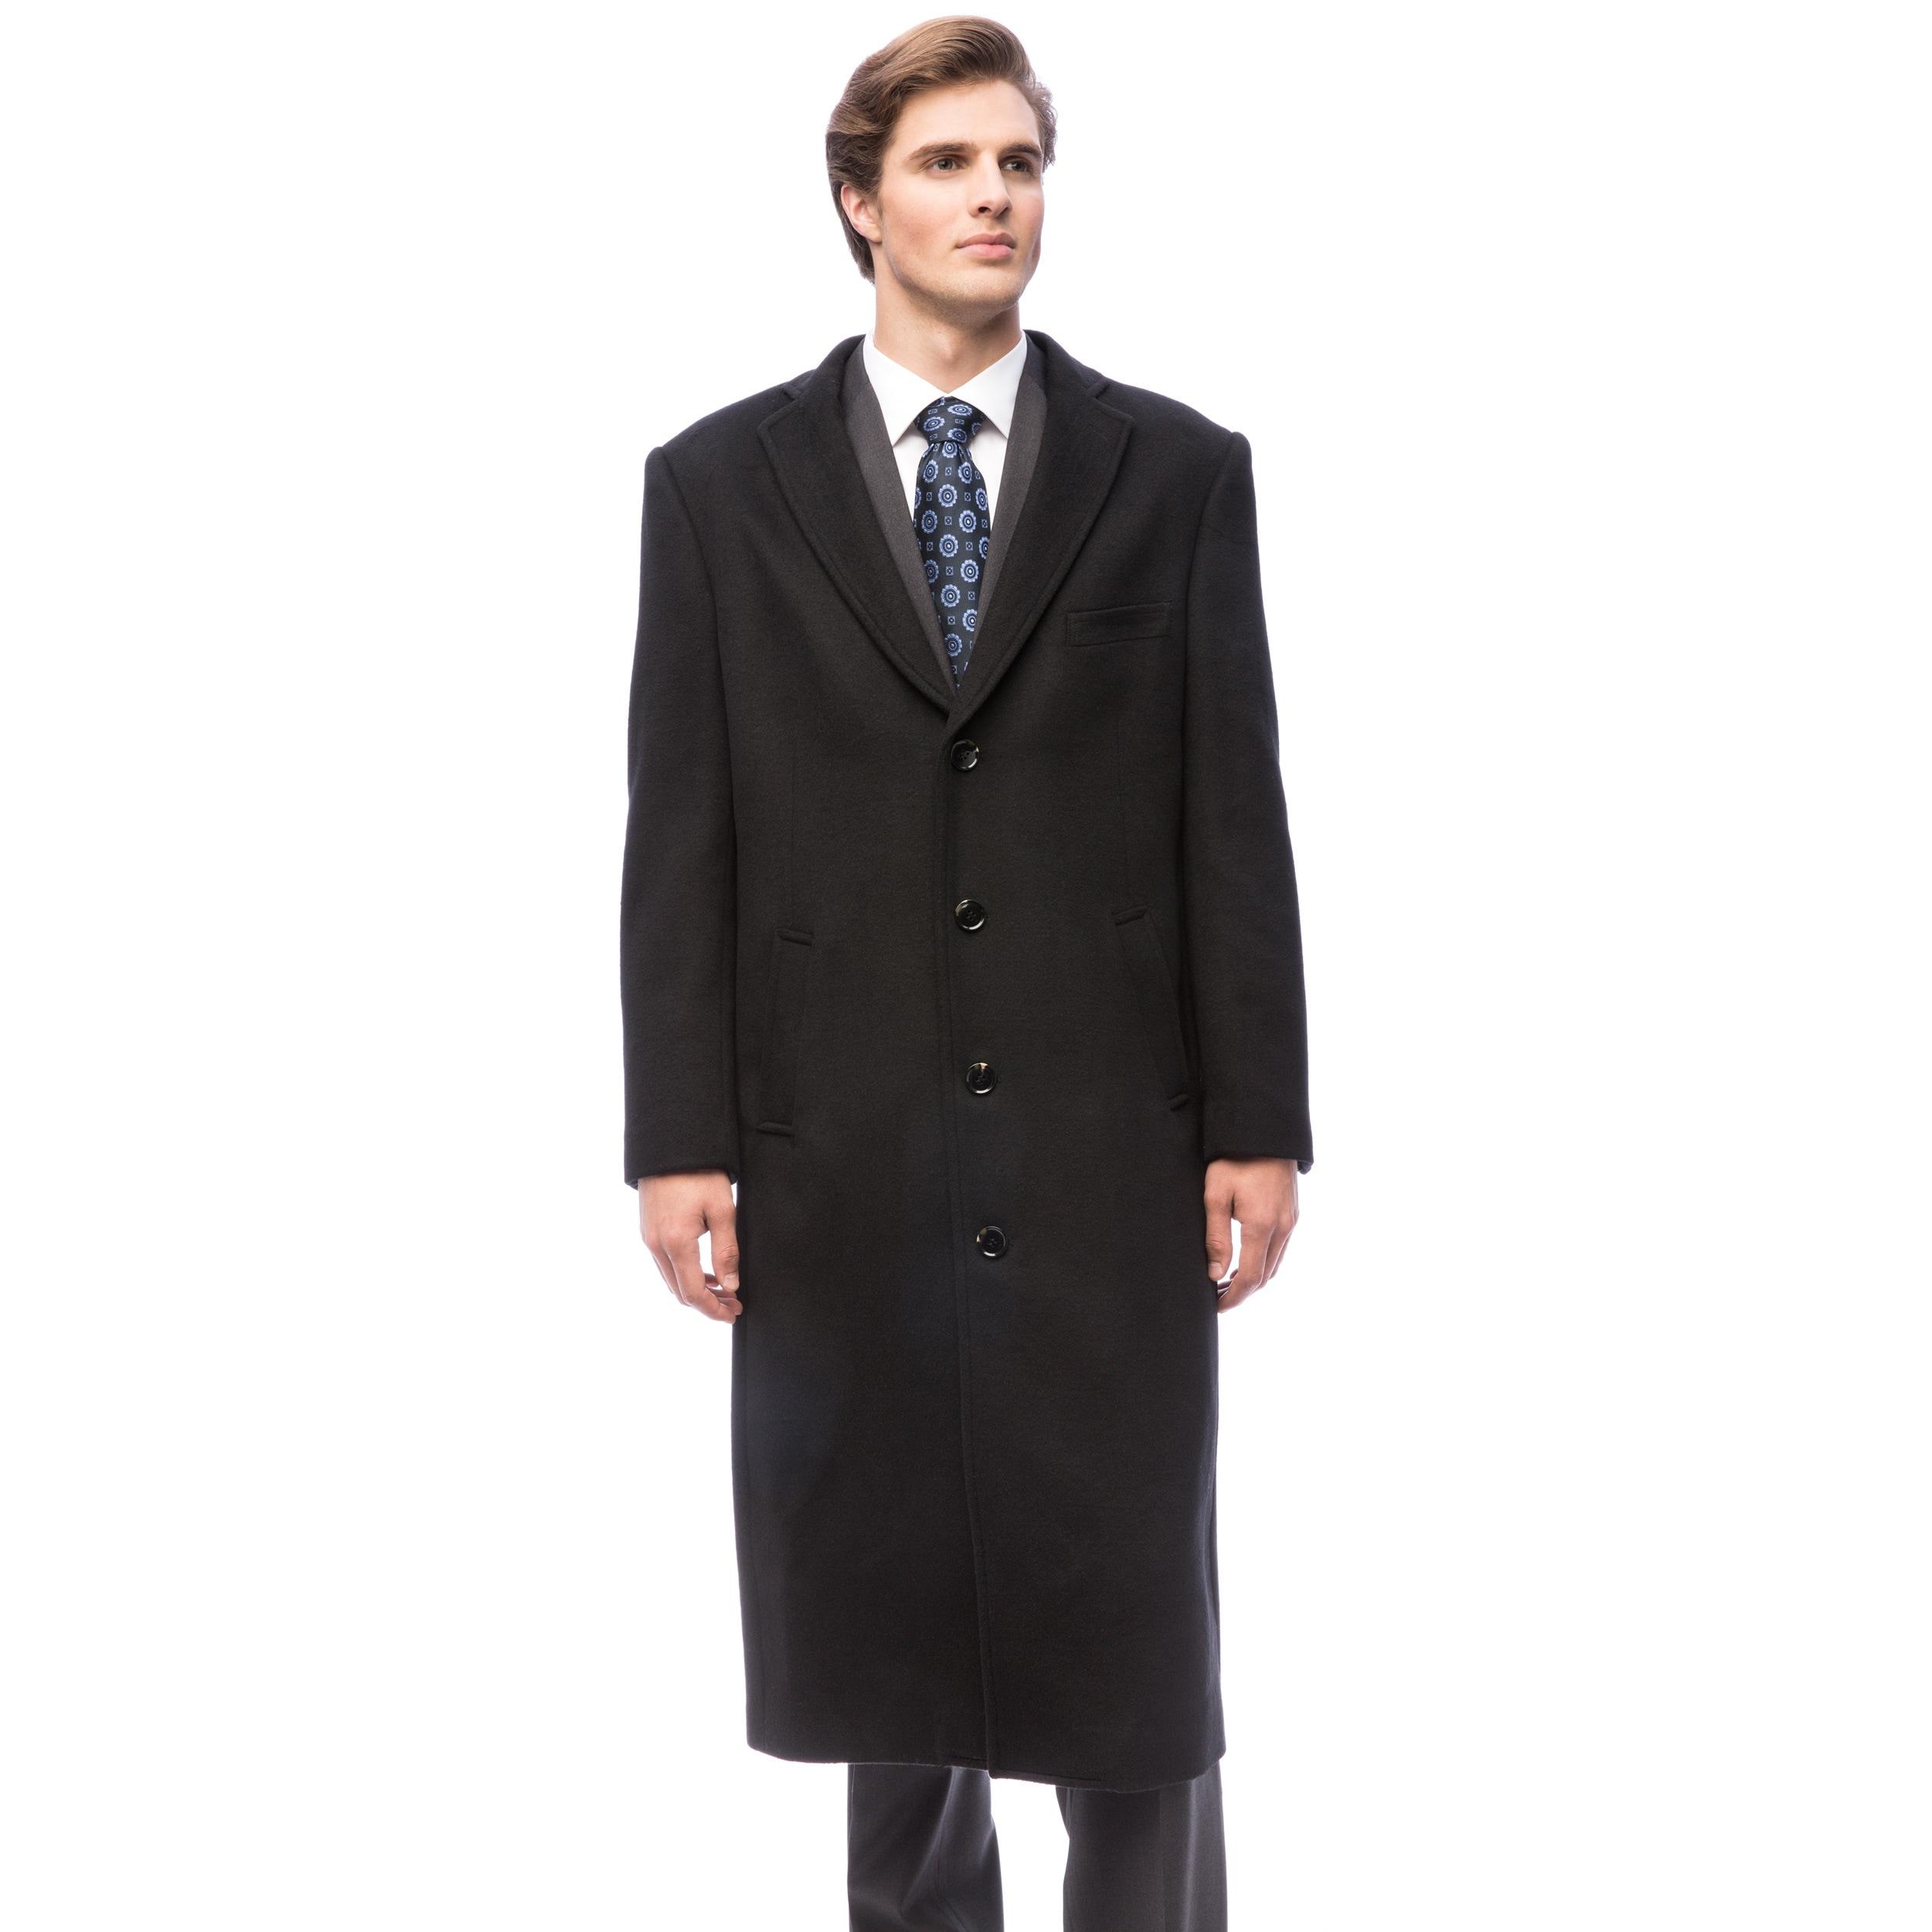 b0cd61fd82da9 DKNY Cashmere Wool Blend Black Coat Ankle Length